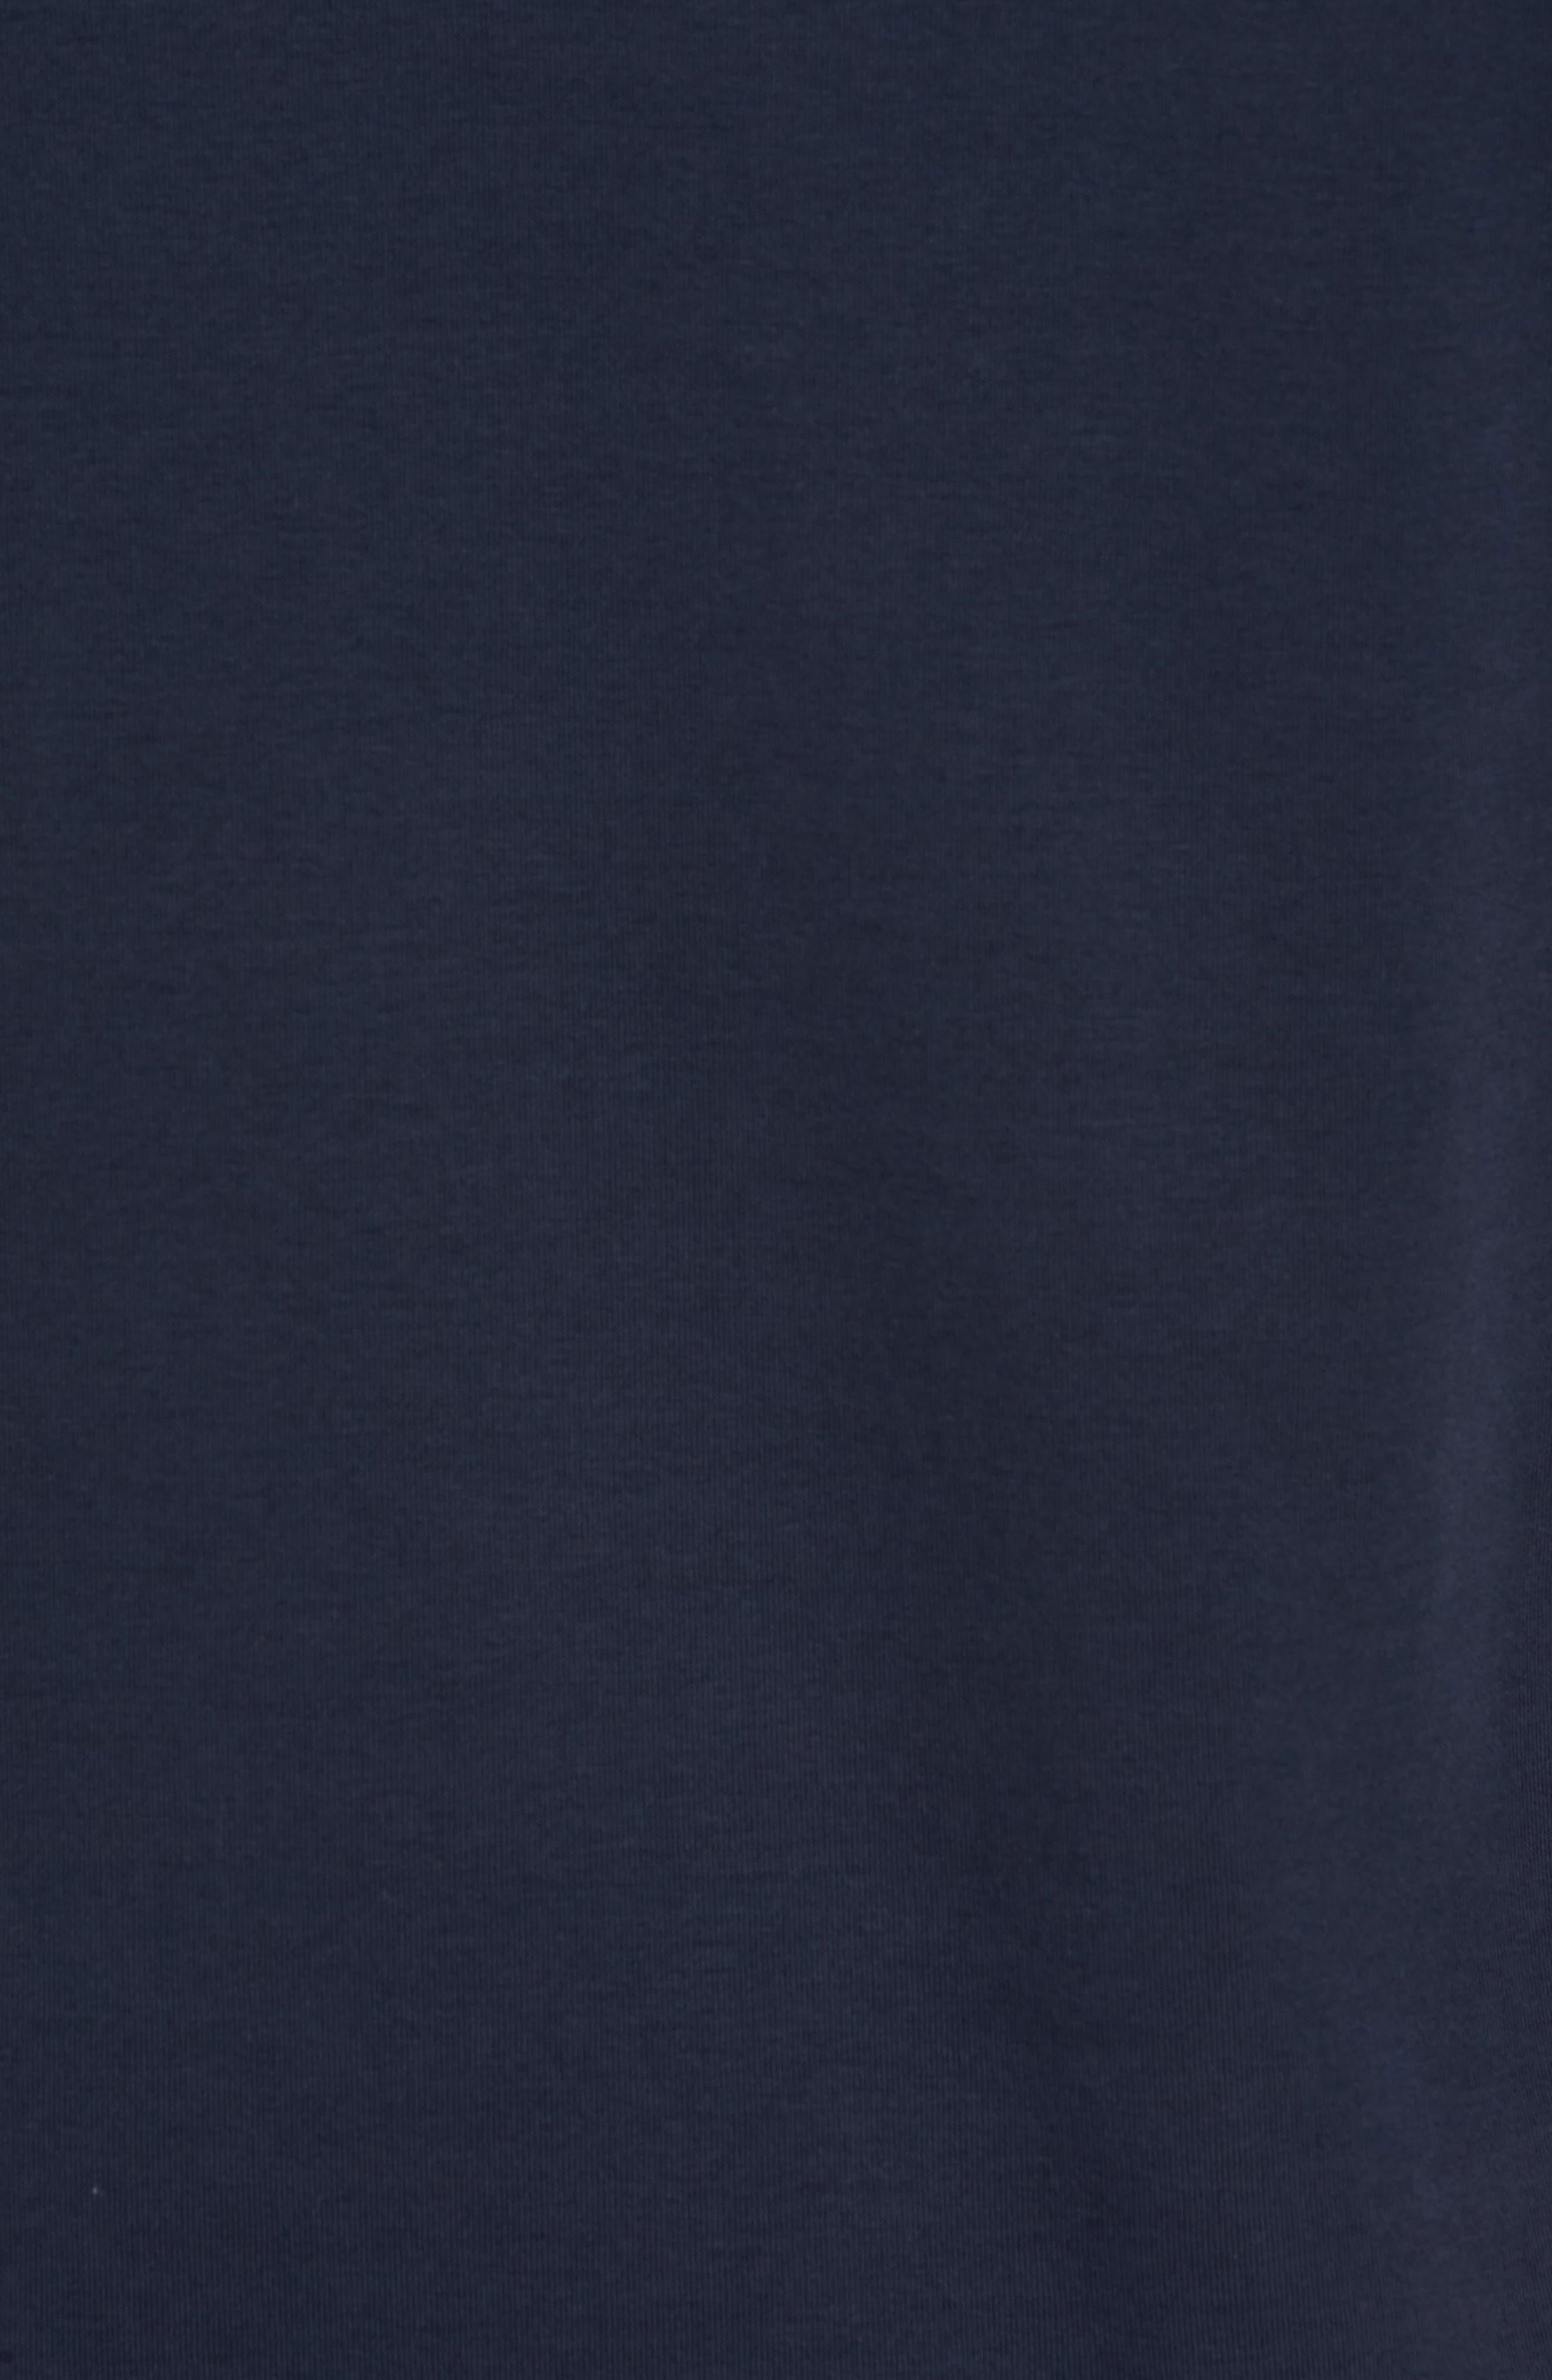 Regular Fit Quarter Zip Pullover,                             Alternate thumbnail 5, color,                             411